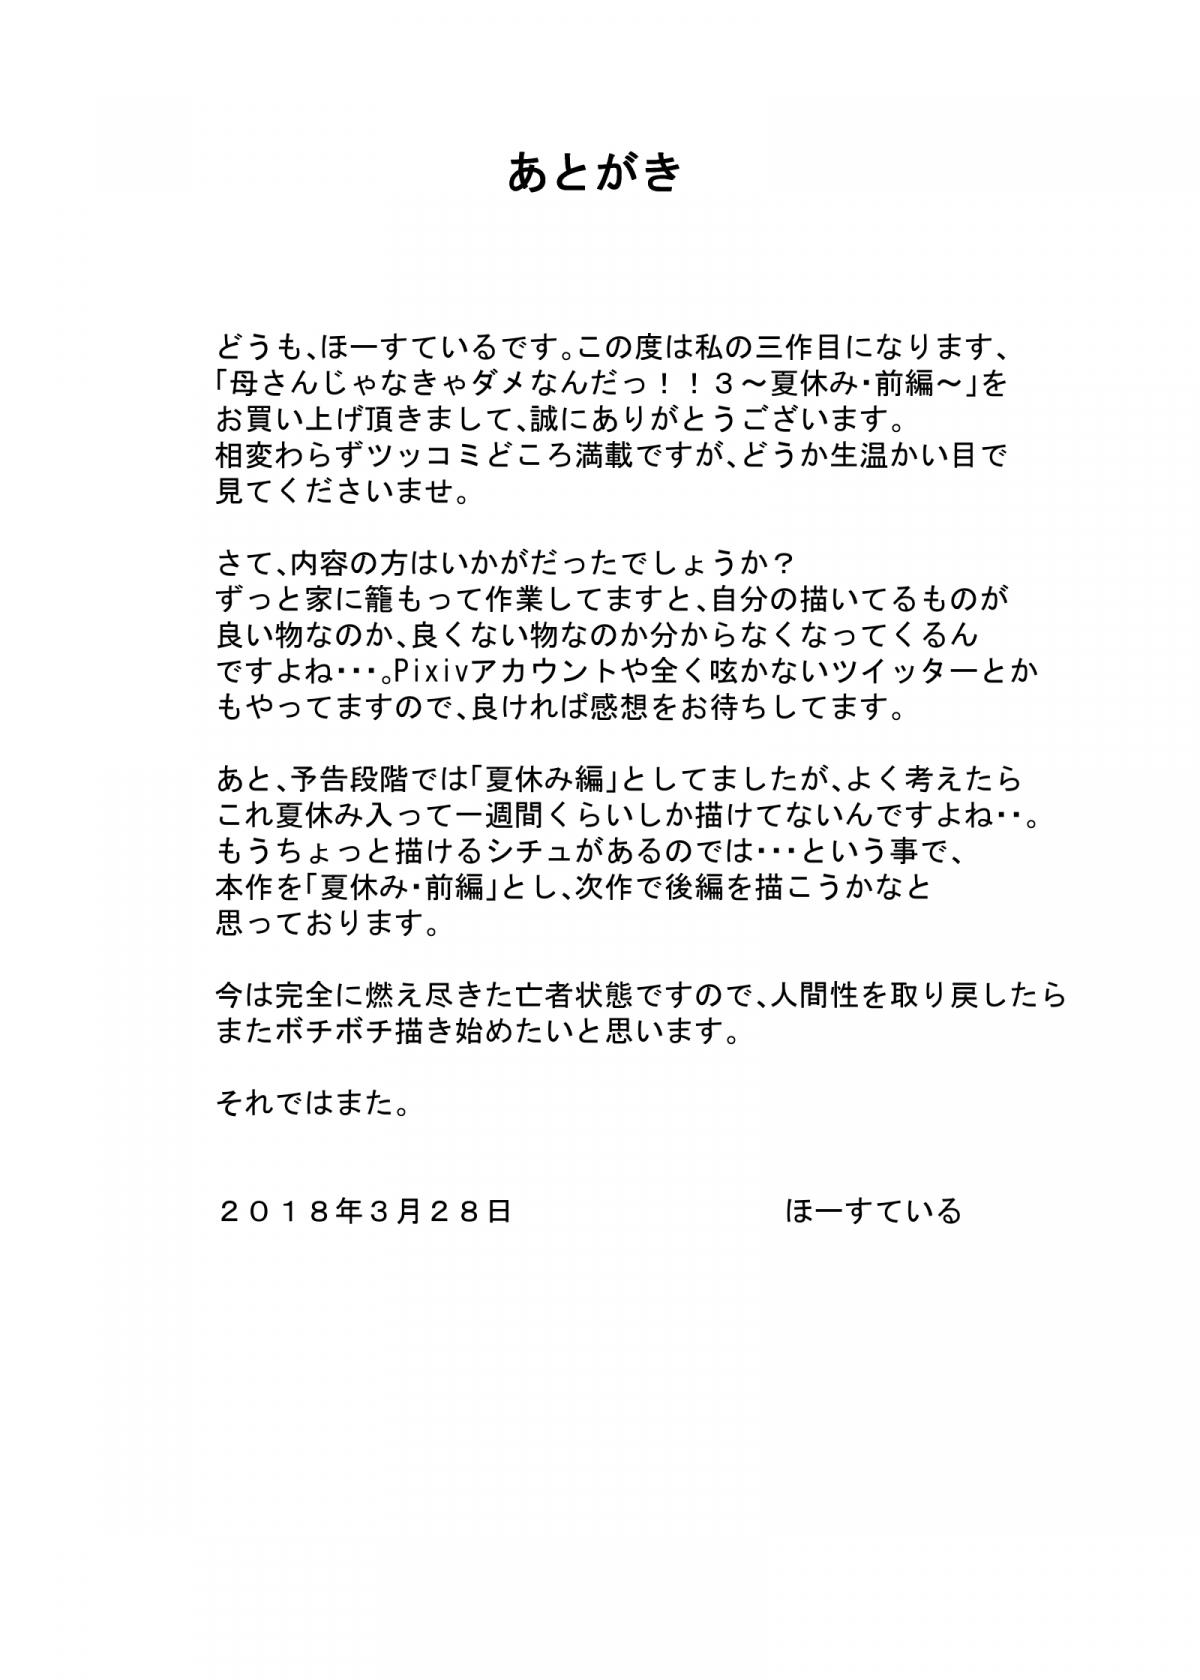 HentaiVN.net - Ảnh 50 - Kaa-san Janakya Dame Nanda!! 3 ~Natsuyasumi Zenpen~ - Mother it has to be you ~Summer Holiday First Part 1~ - Oneshot